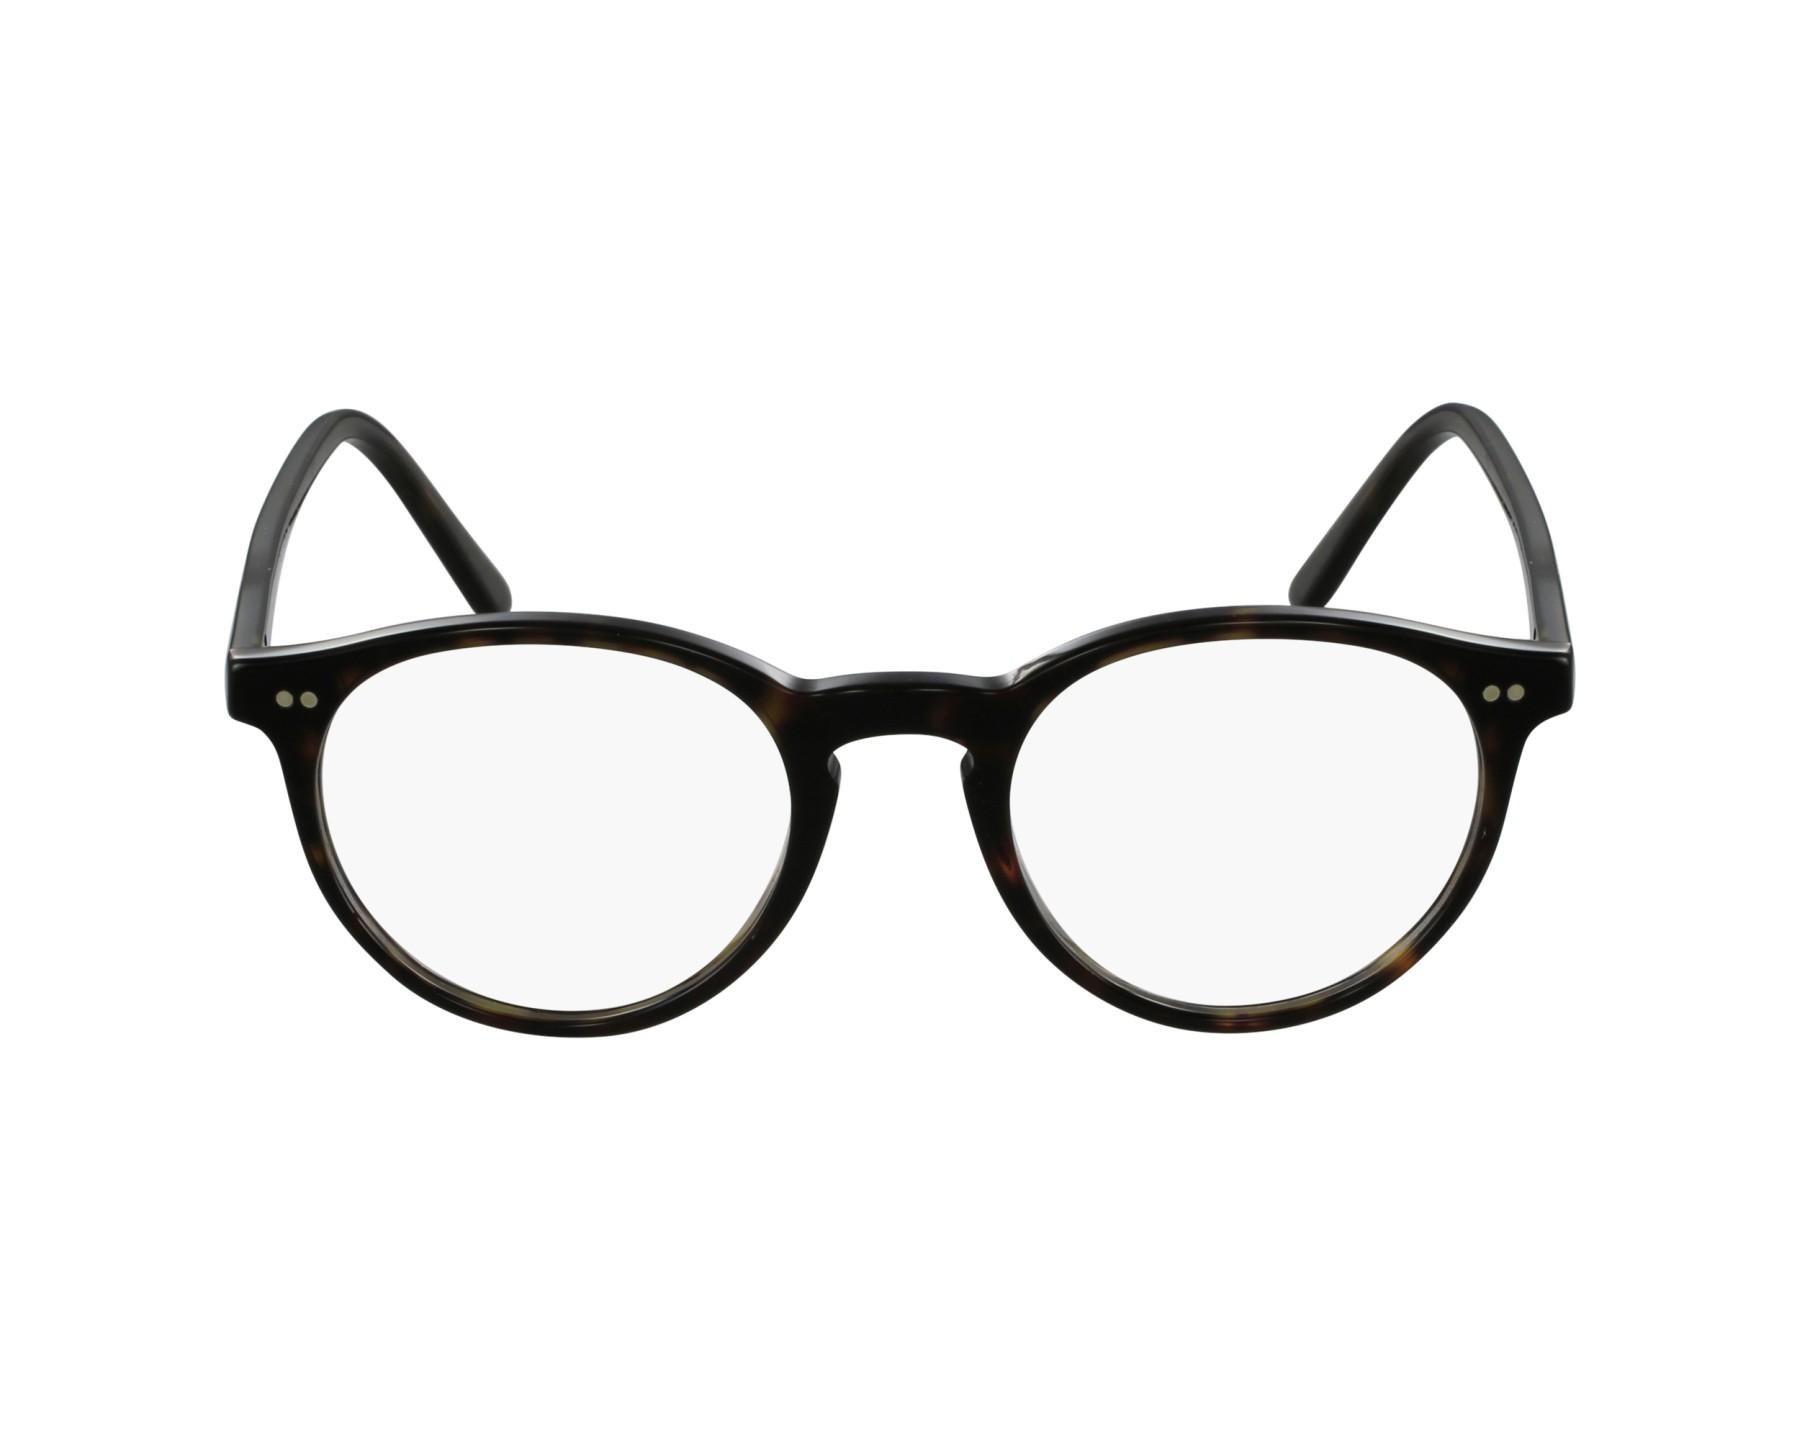 545d37cabc875d ... WörterSee Public Relations, polo ralph lauren brillen kollektion